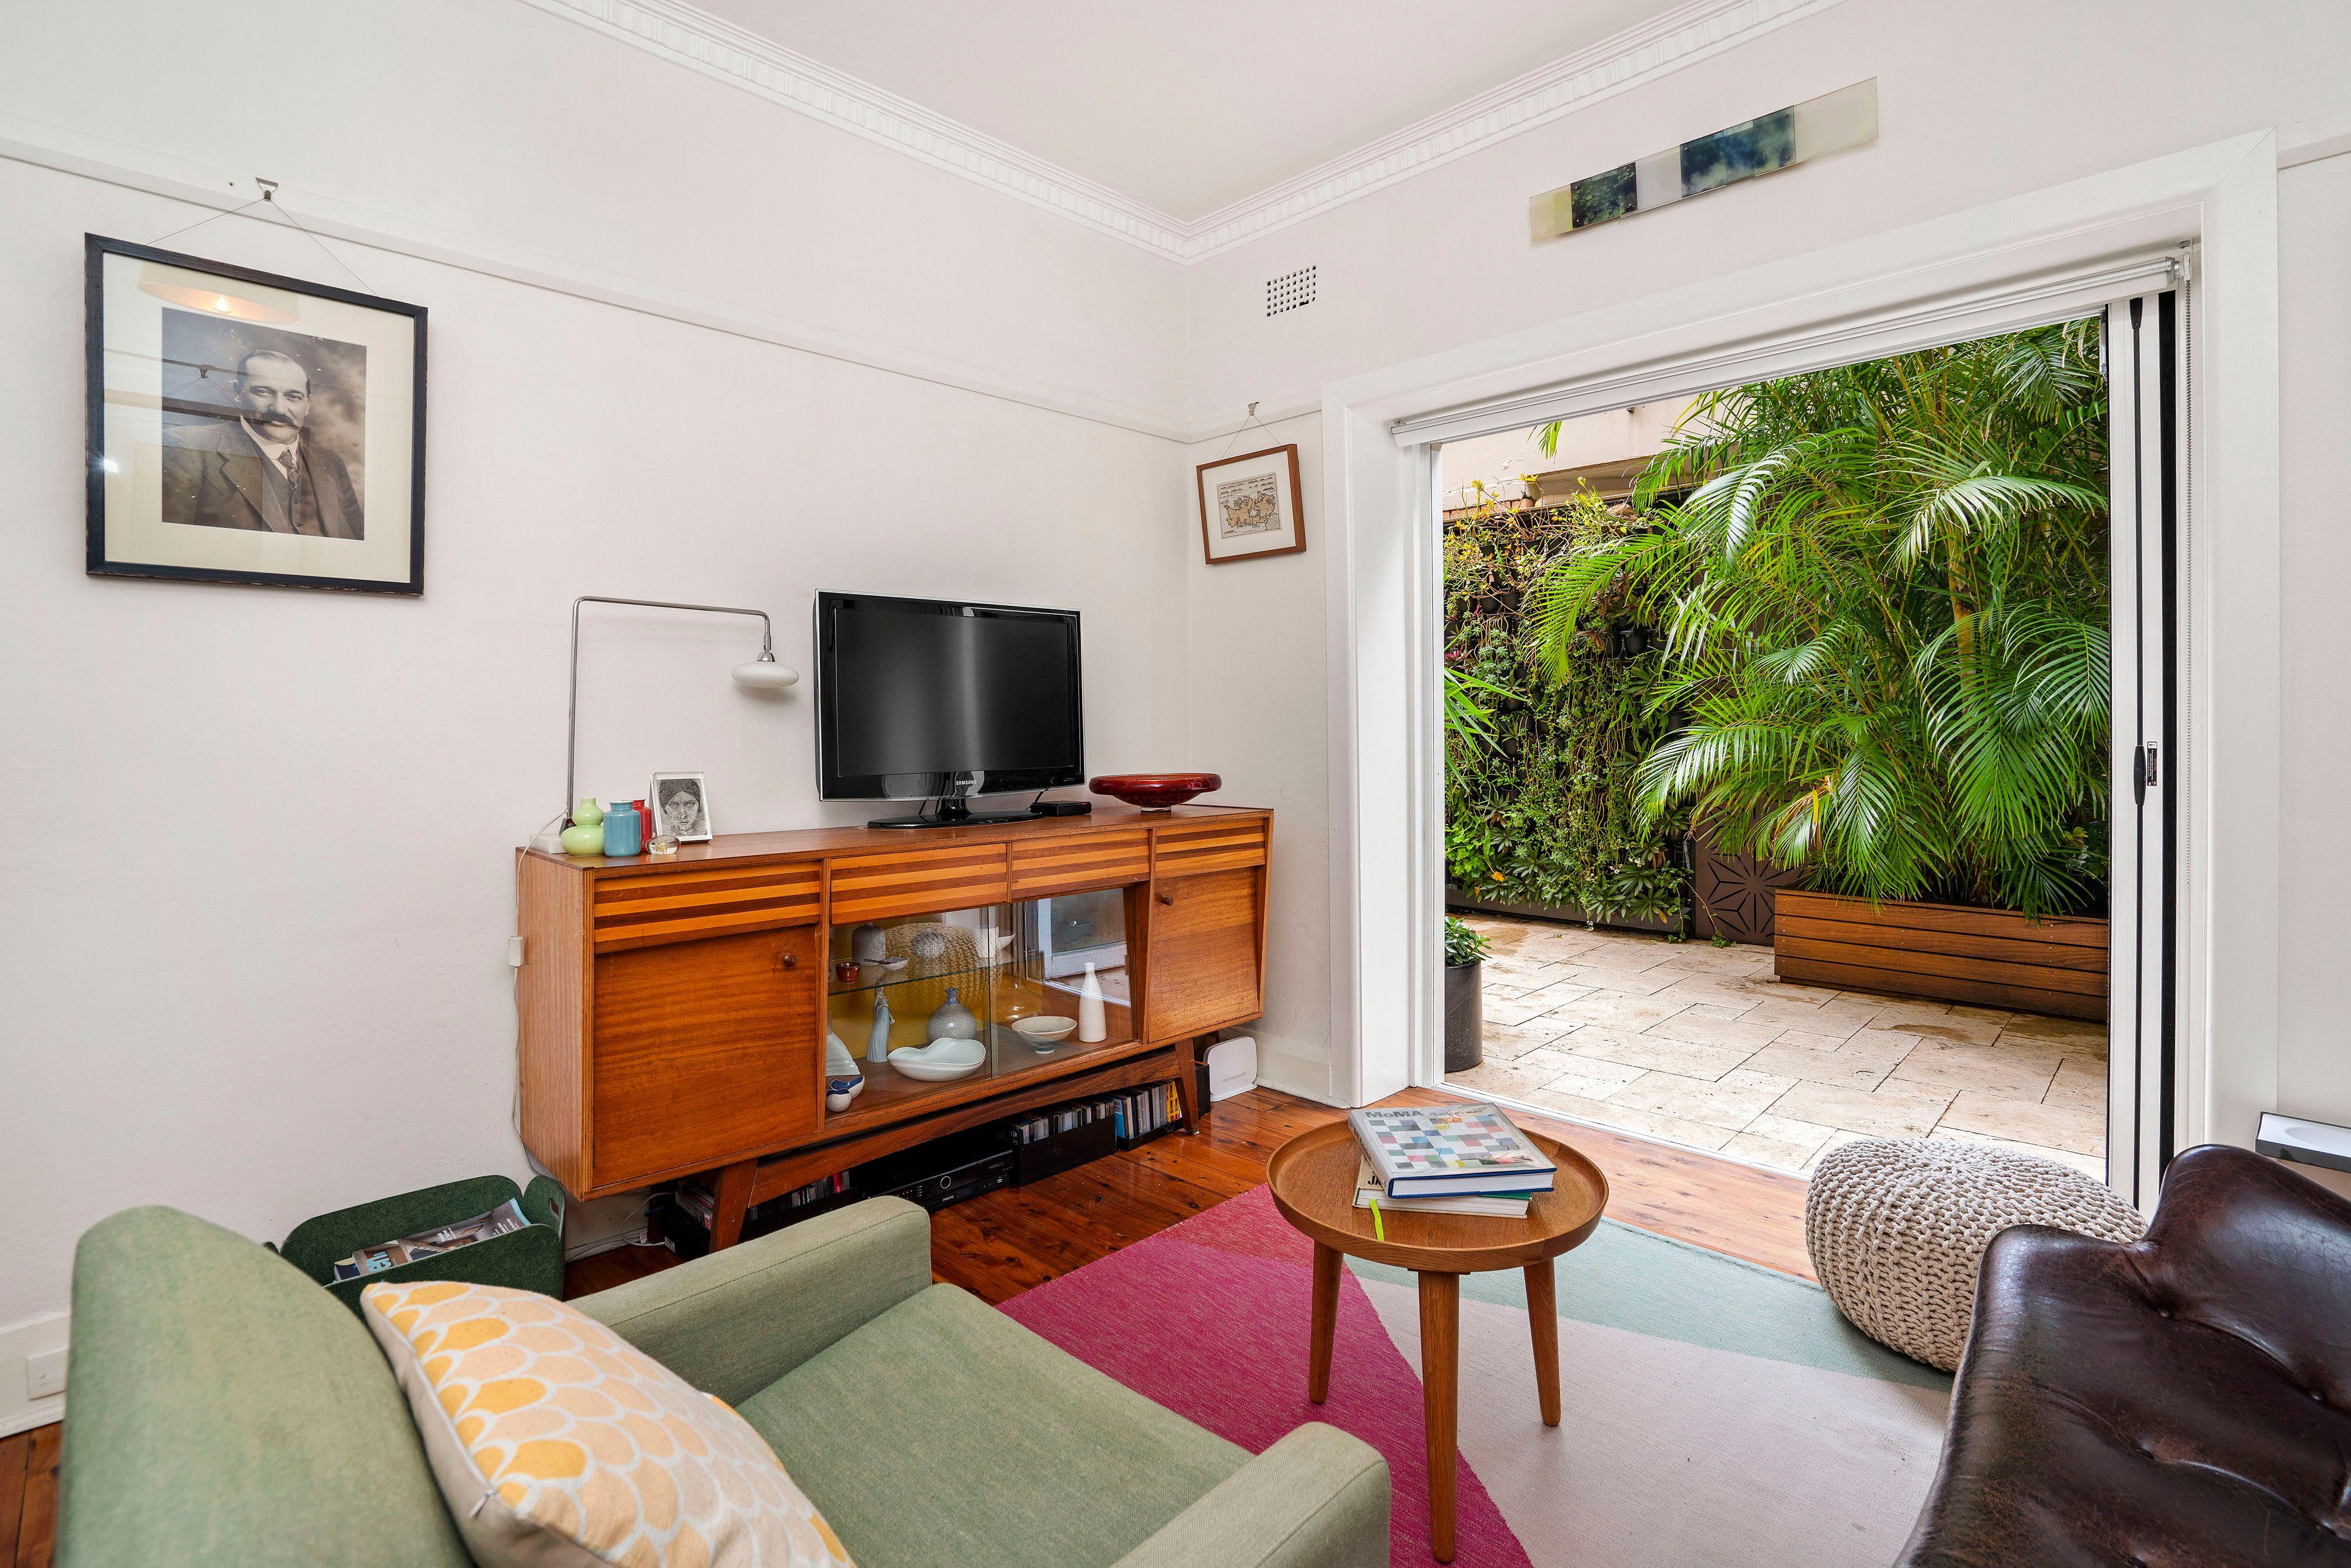 3 Room Flat sold apartment 3/5 edward street, bondi beach nsw 2026 - may